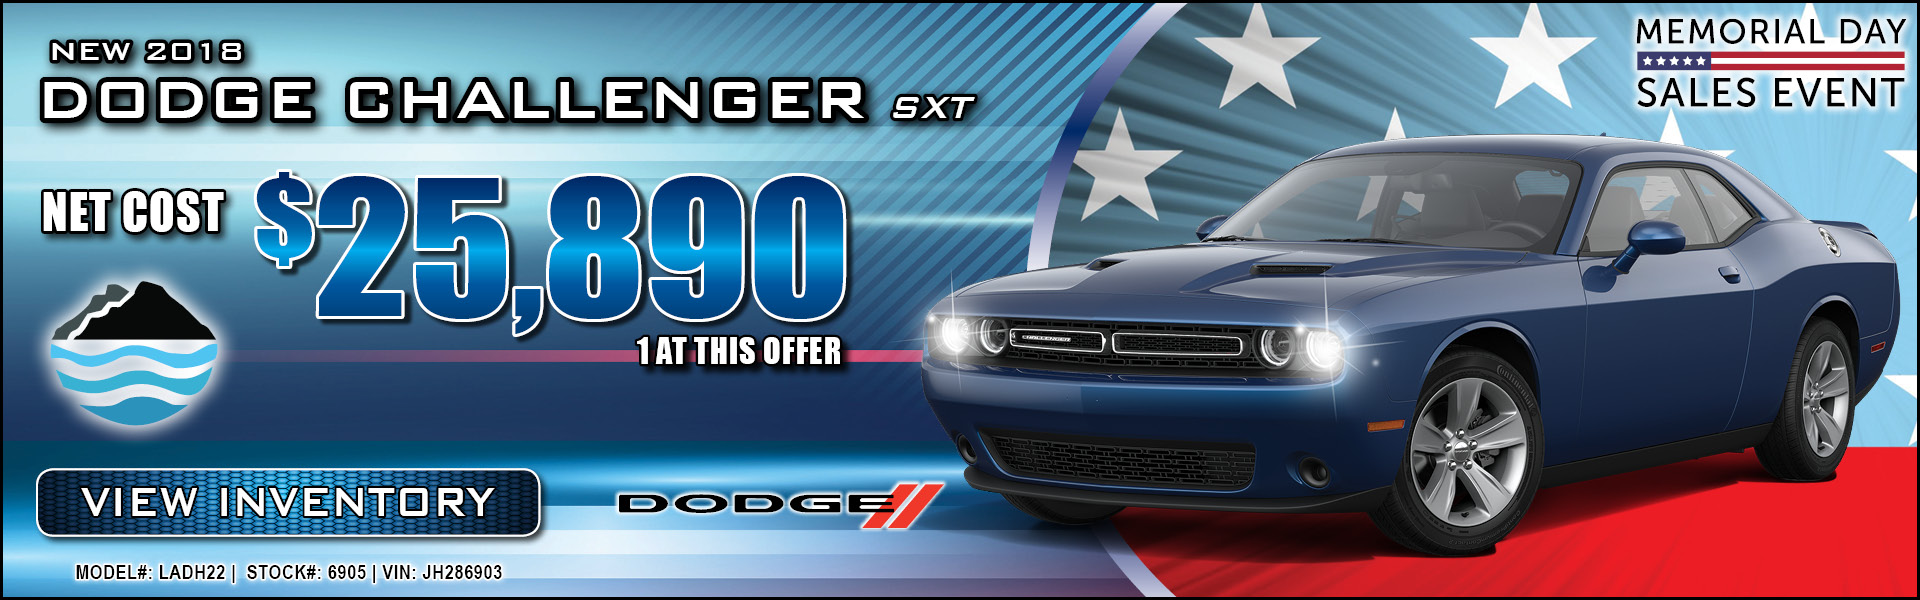 Dodge Challenger $25,890